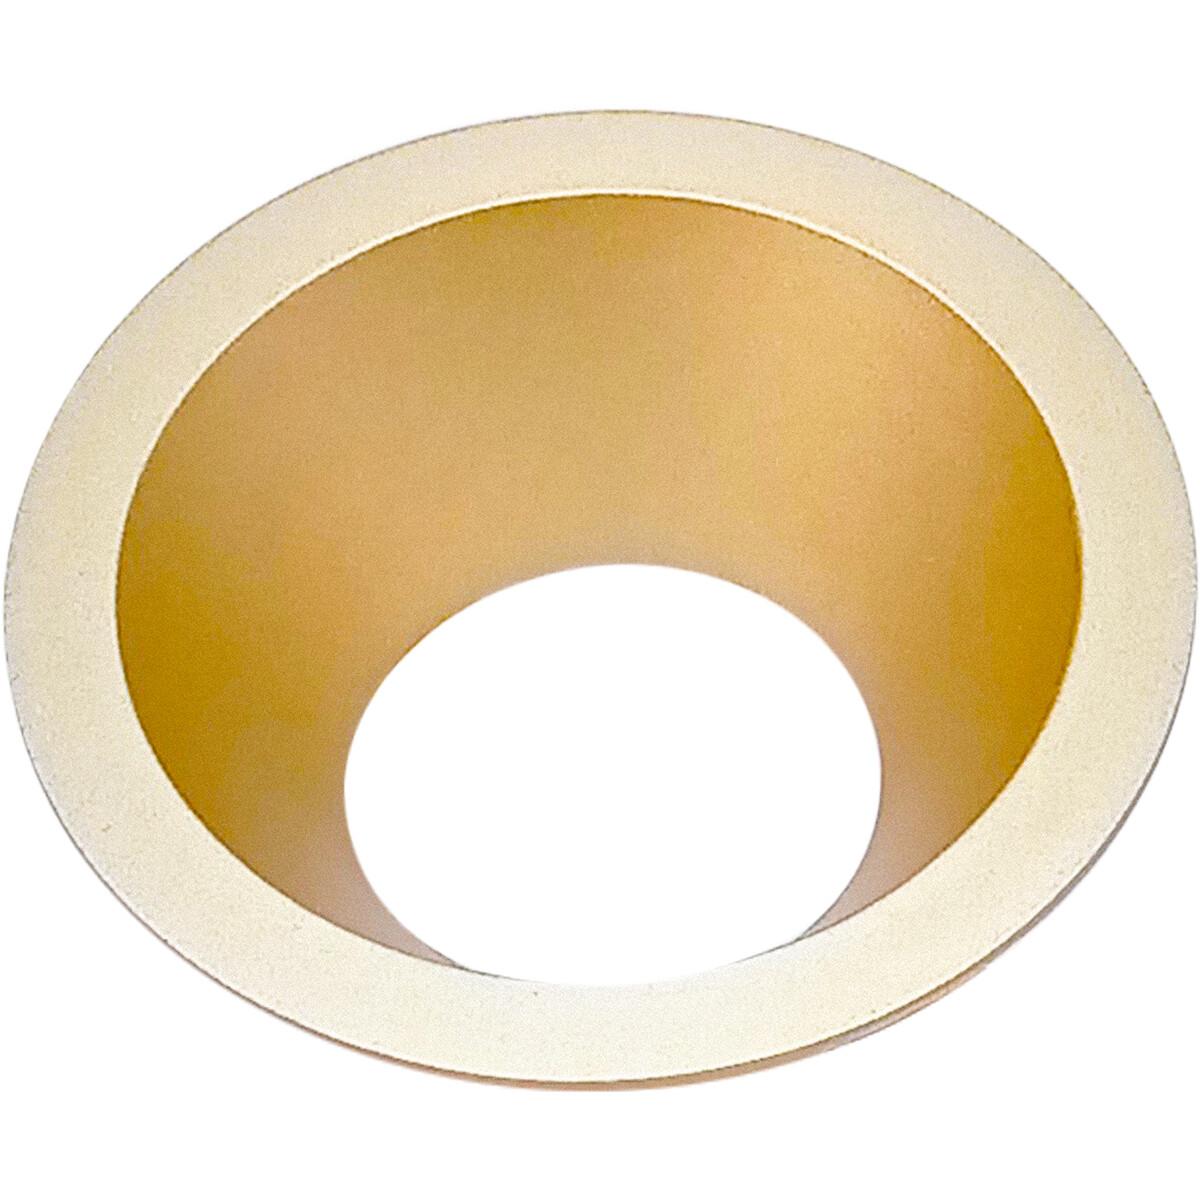 Spot Ring - Pragmi Cliron Pro - Rond - Mat Goud